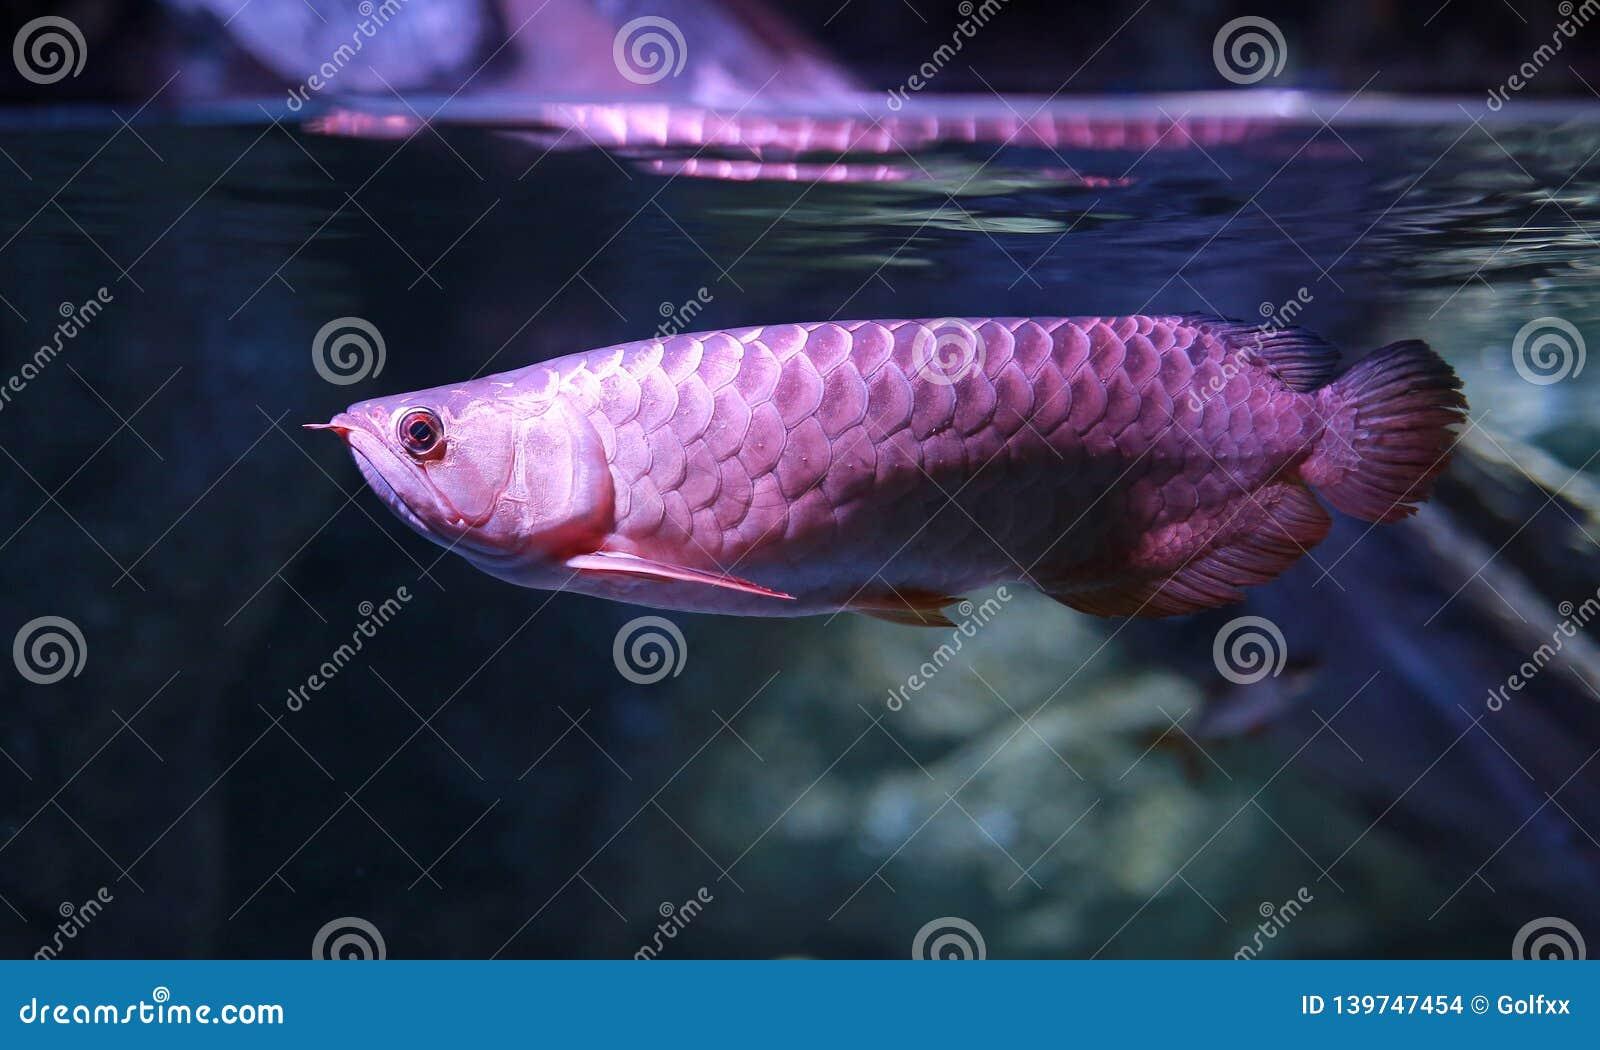 Arowana Fish Swiming In Water At Aquarium Stock Photo ...